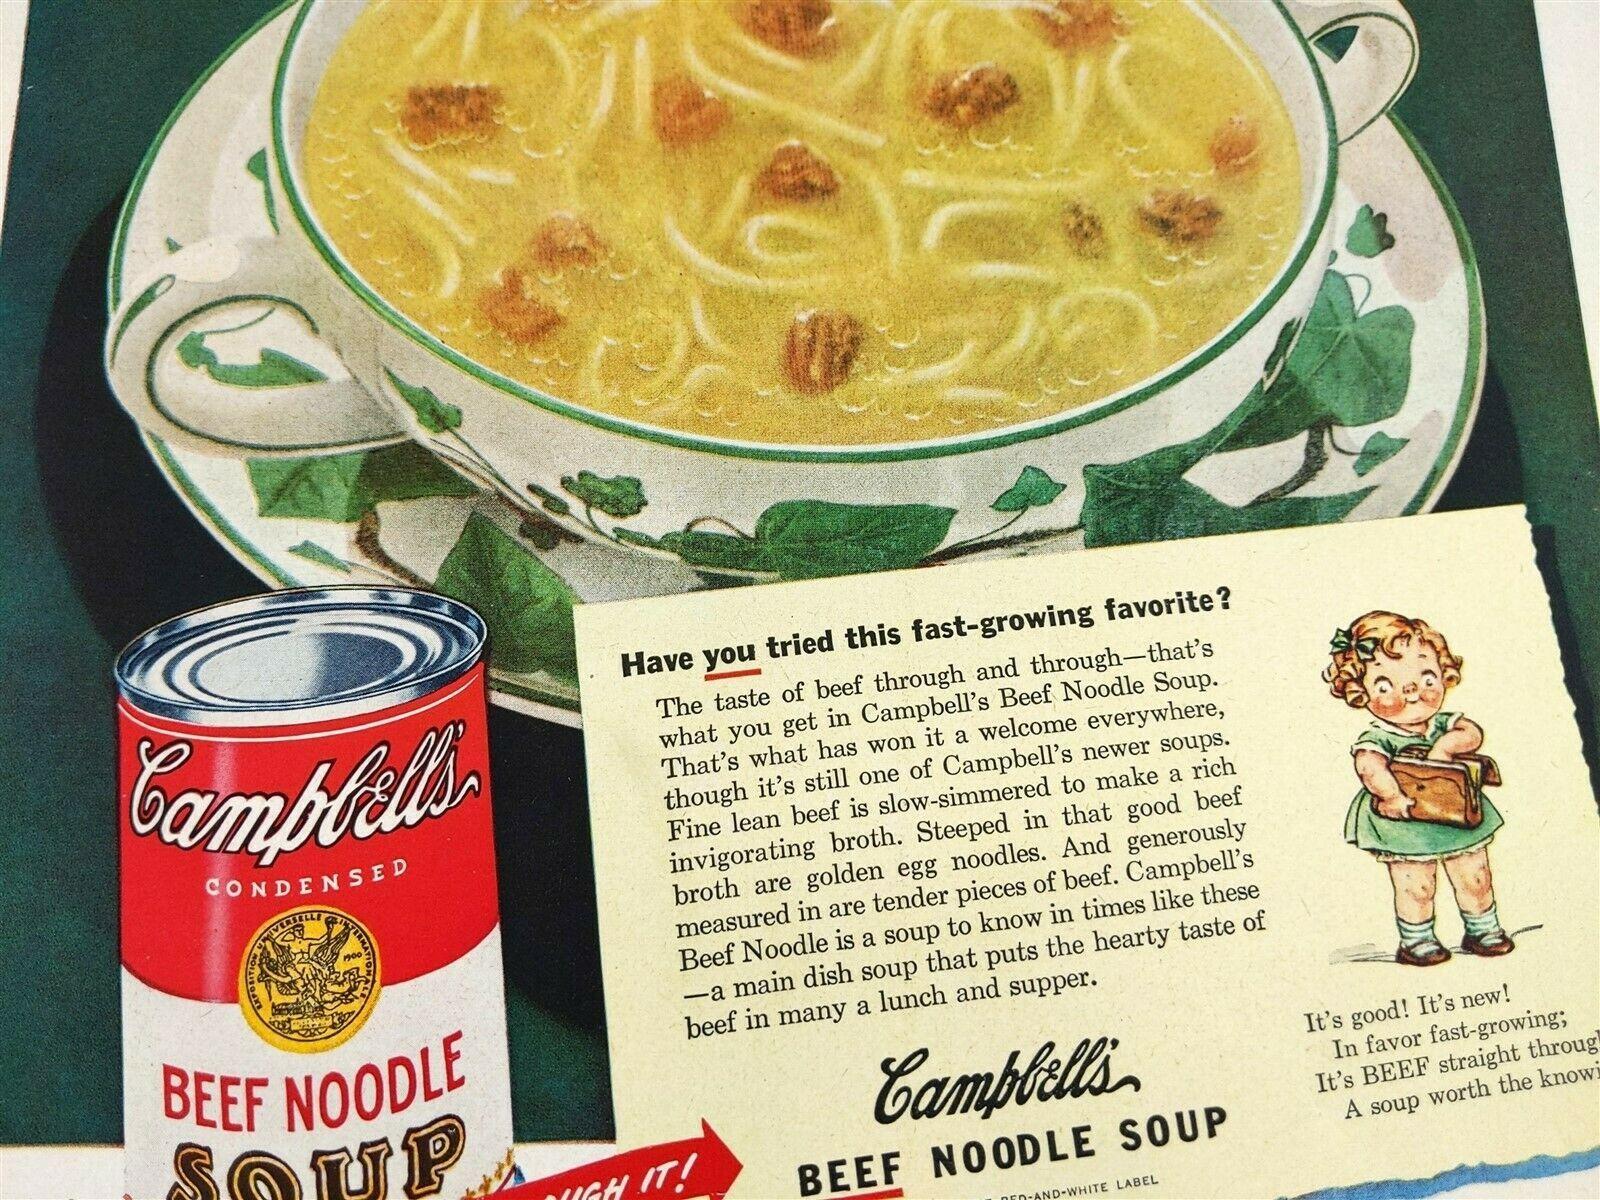 1948 Campbell's Beef Noodle Soup Vintage Magazine Print Ad image 2